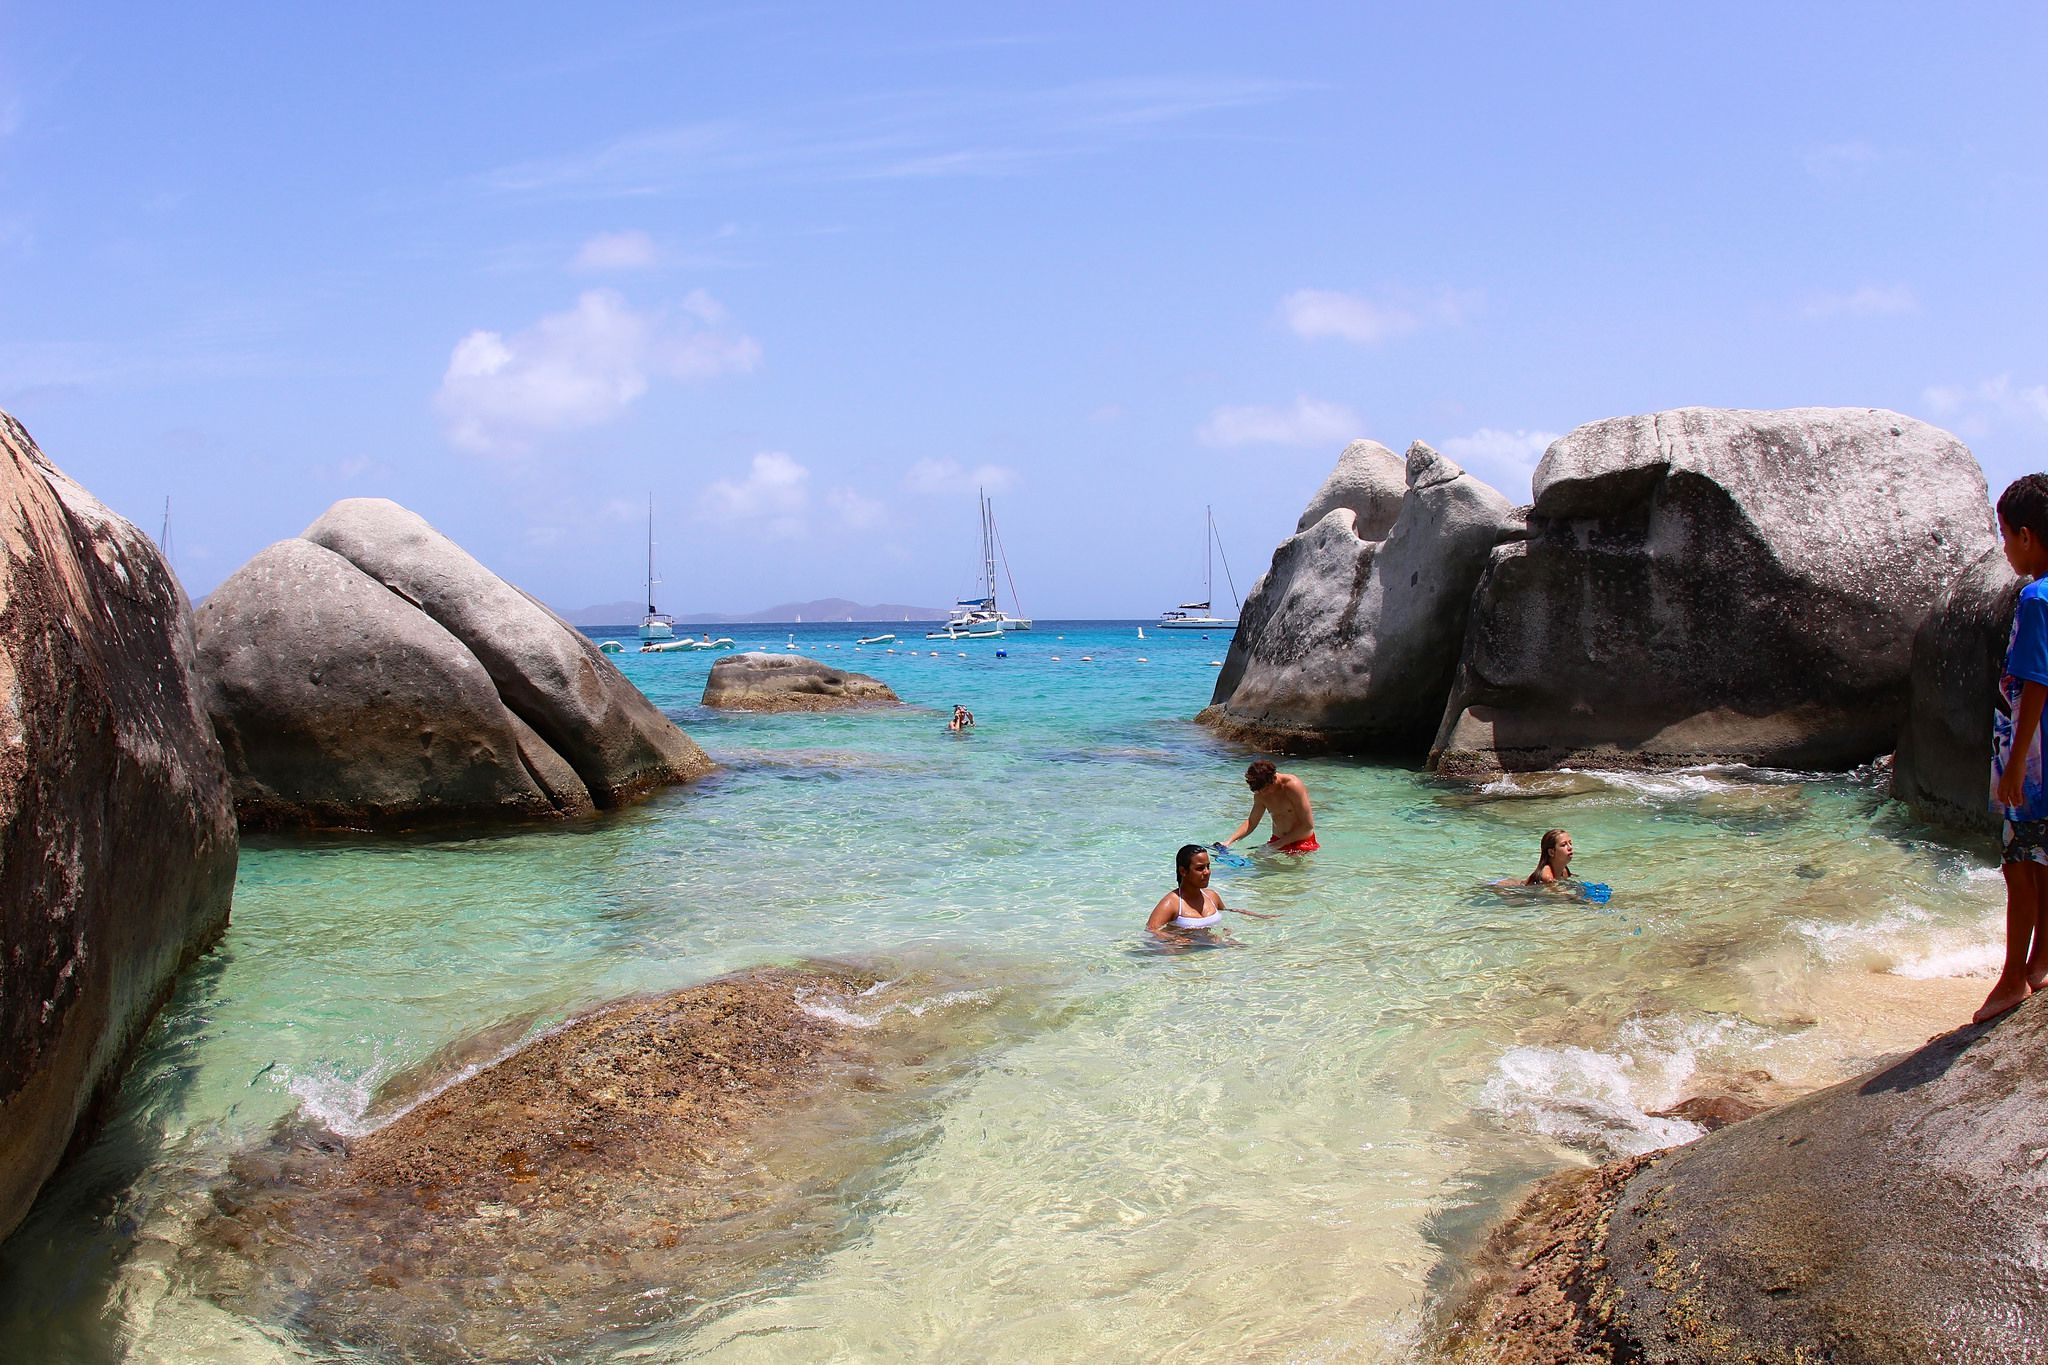 The Baths, Virgin Gorda Island, British Virgin Islands, West Indies  № 1471417 бесплатно